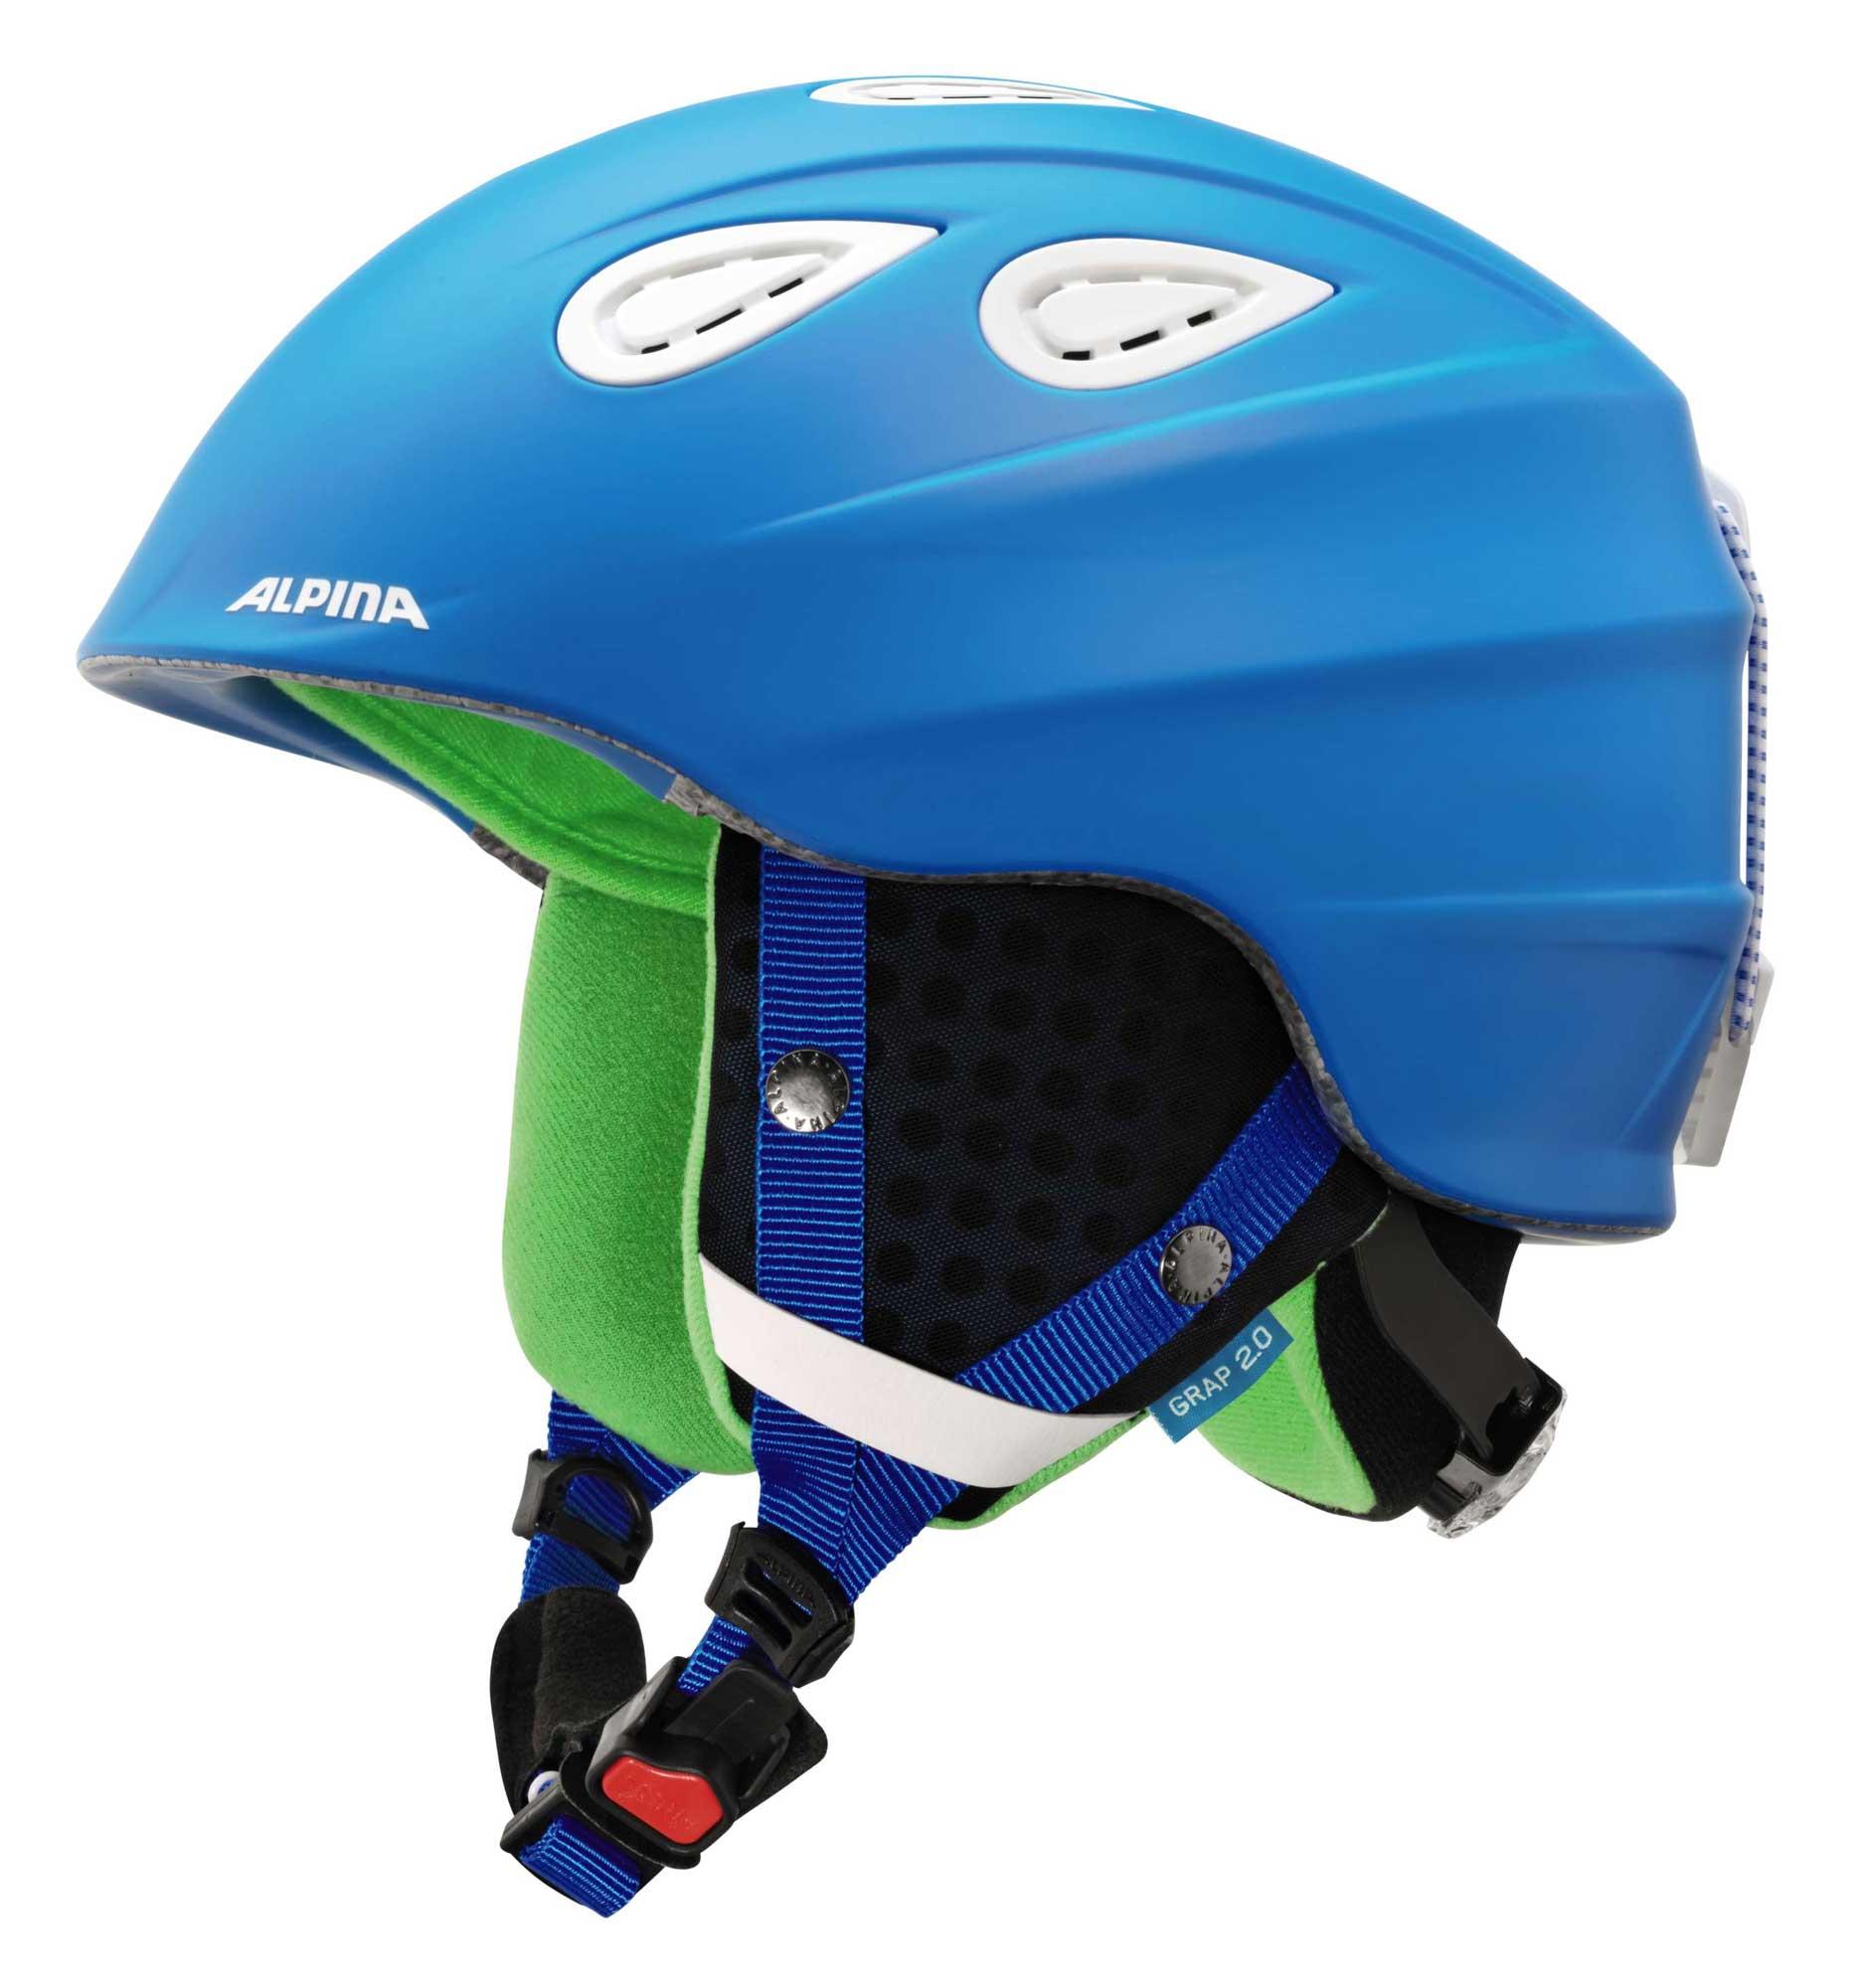 Alpina Grap 2.0 - Allmountain Skihelm - blue matt